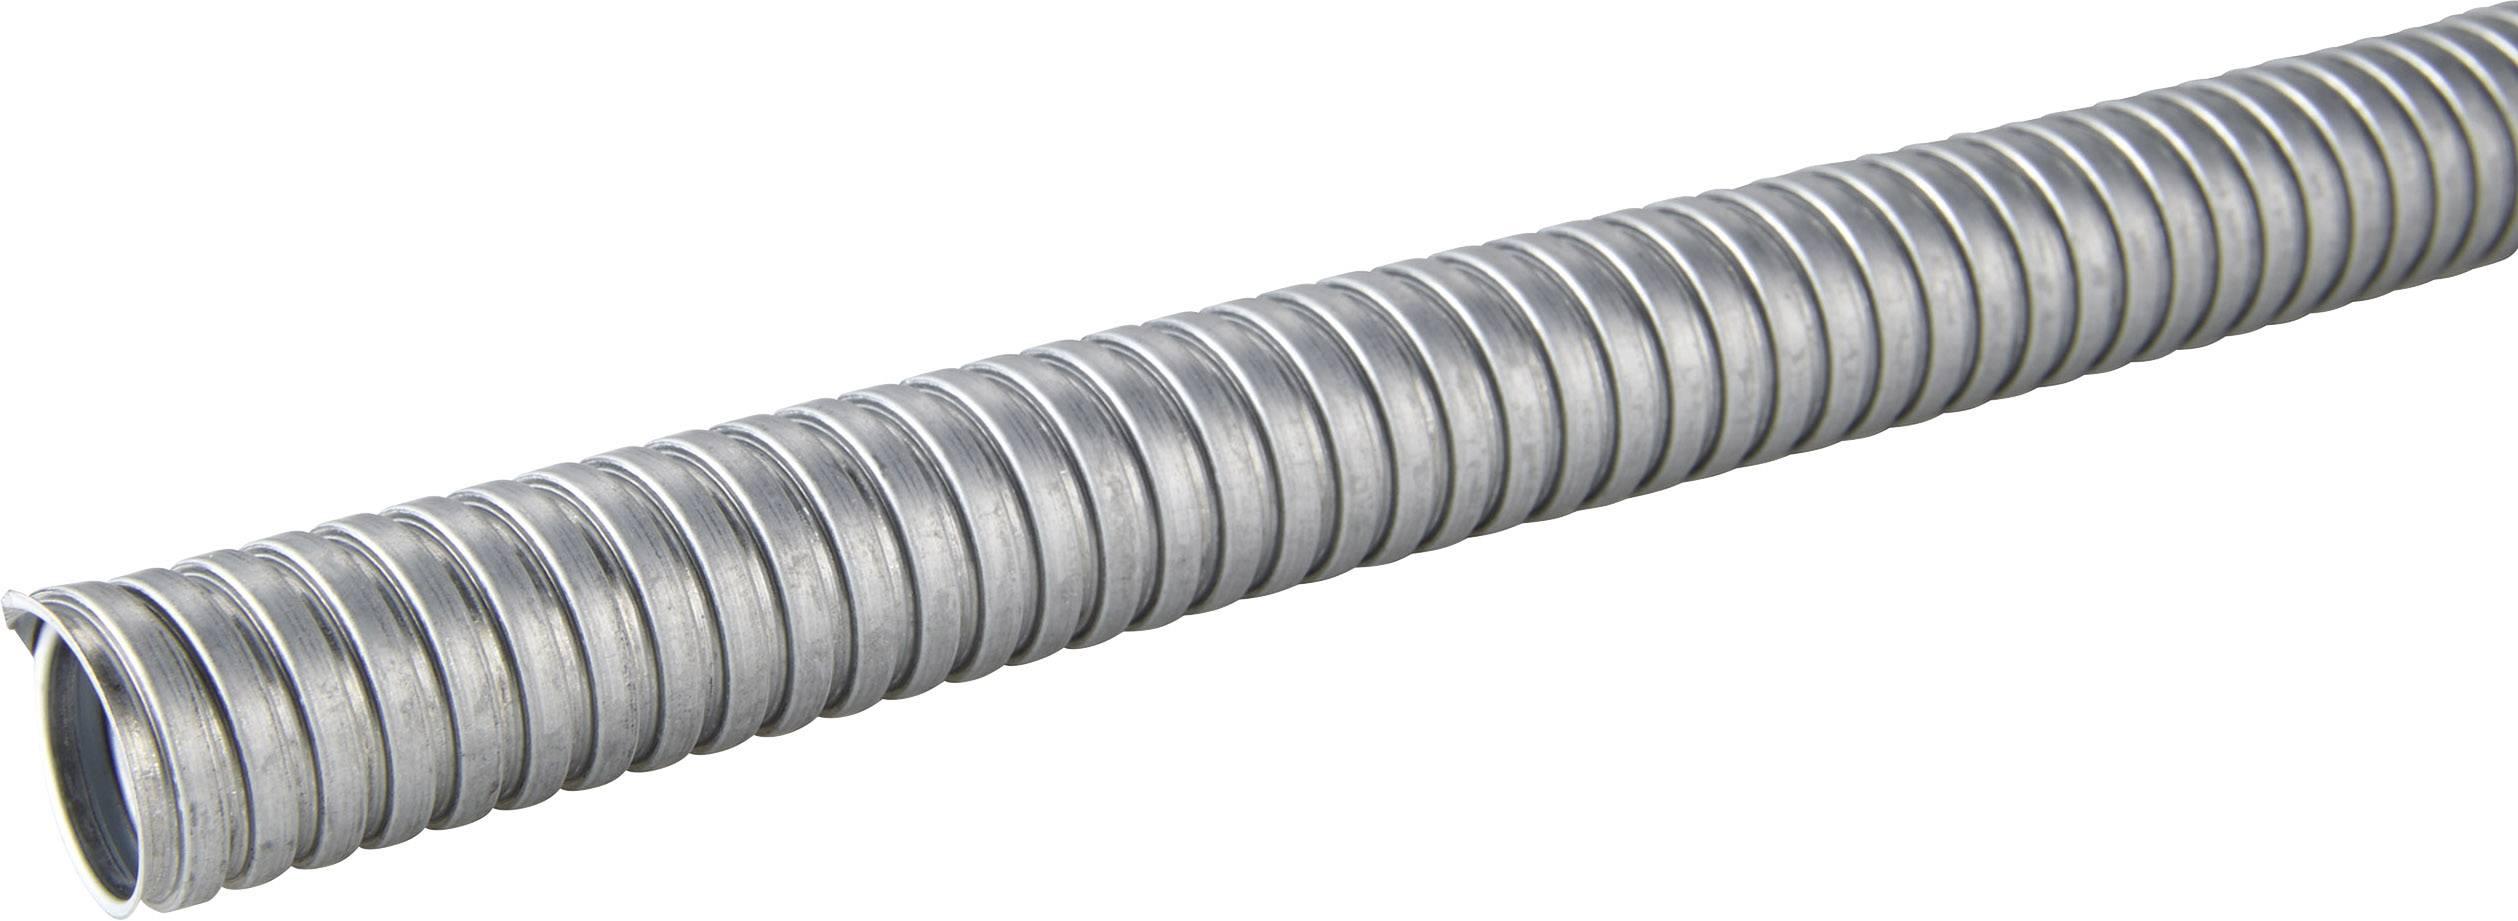 Ochranná hadice na kov LAPP SILVYN® AS 29/31x36 61802140, stříbrná, 25 m